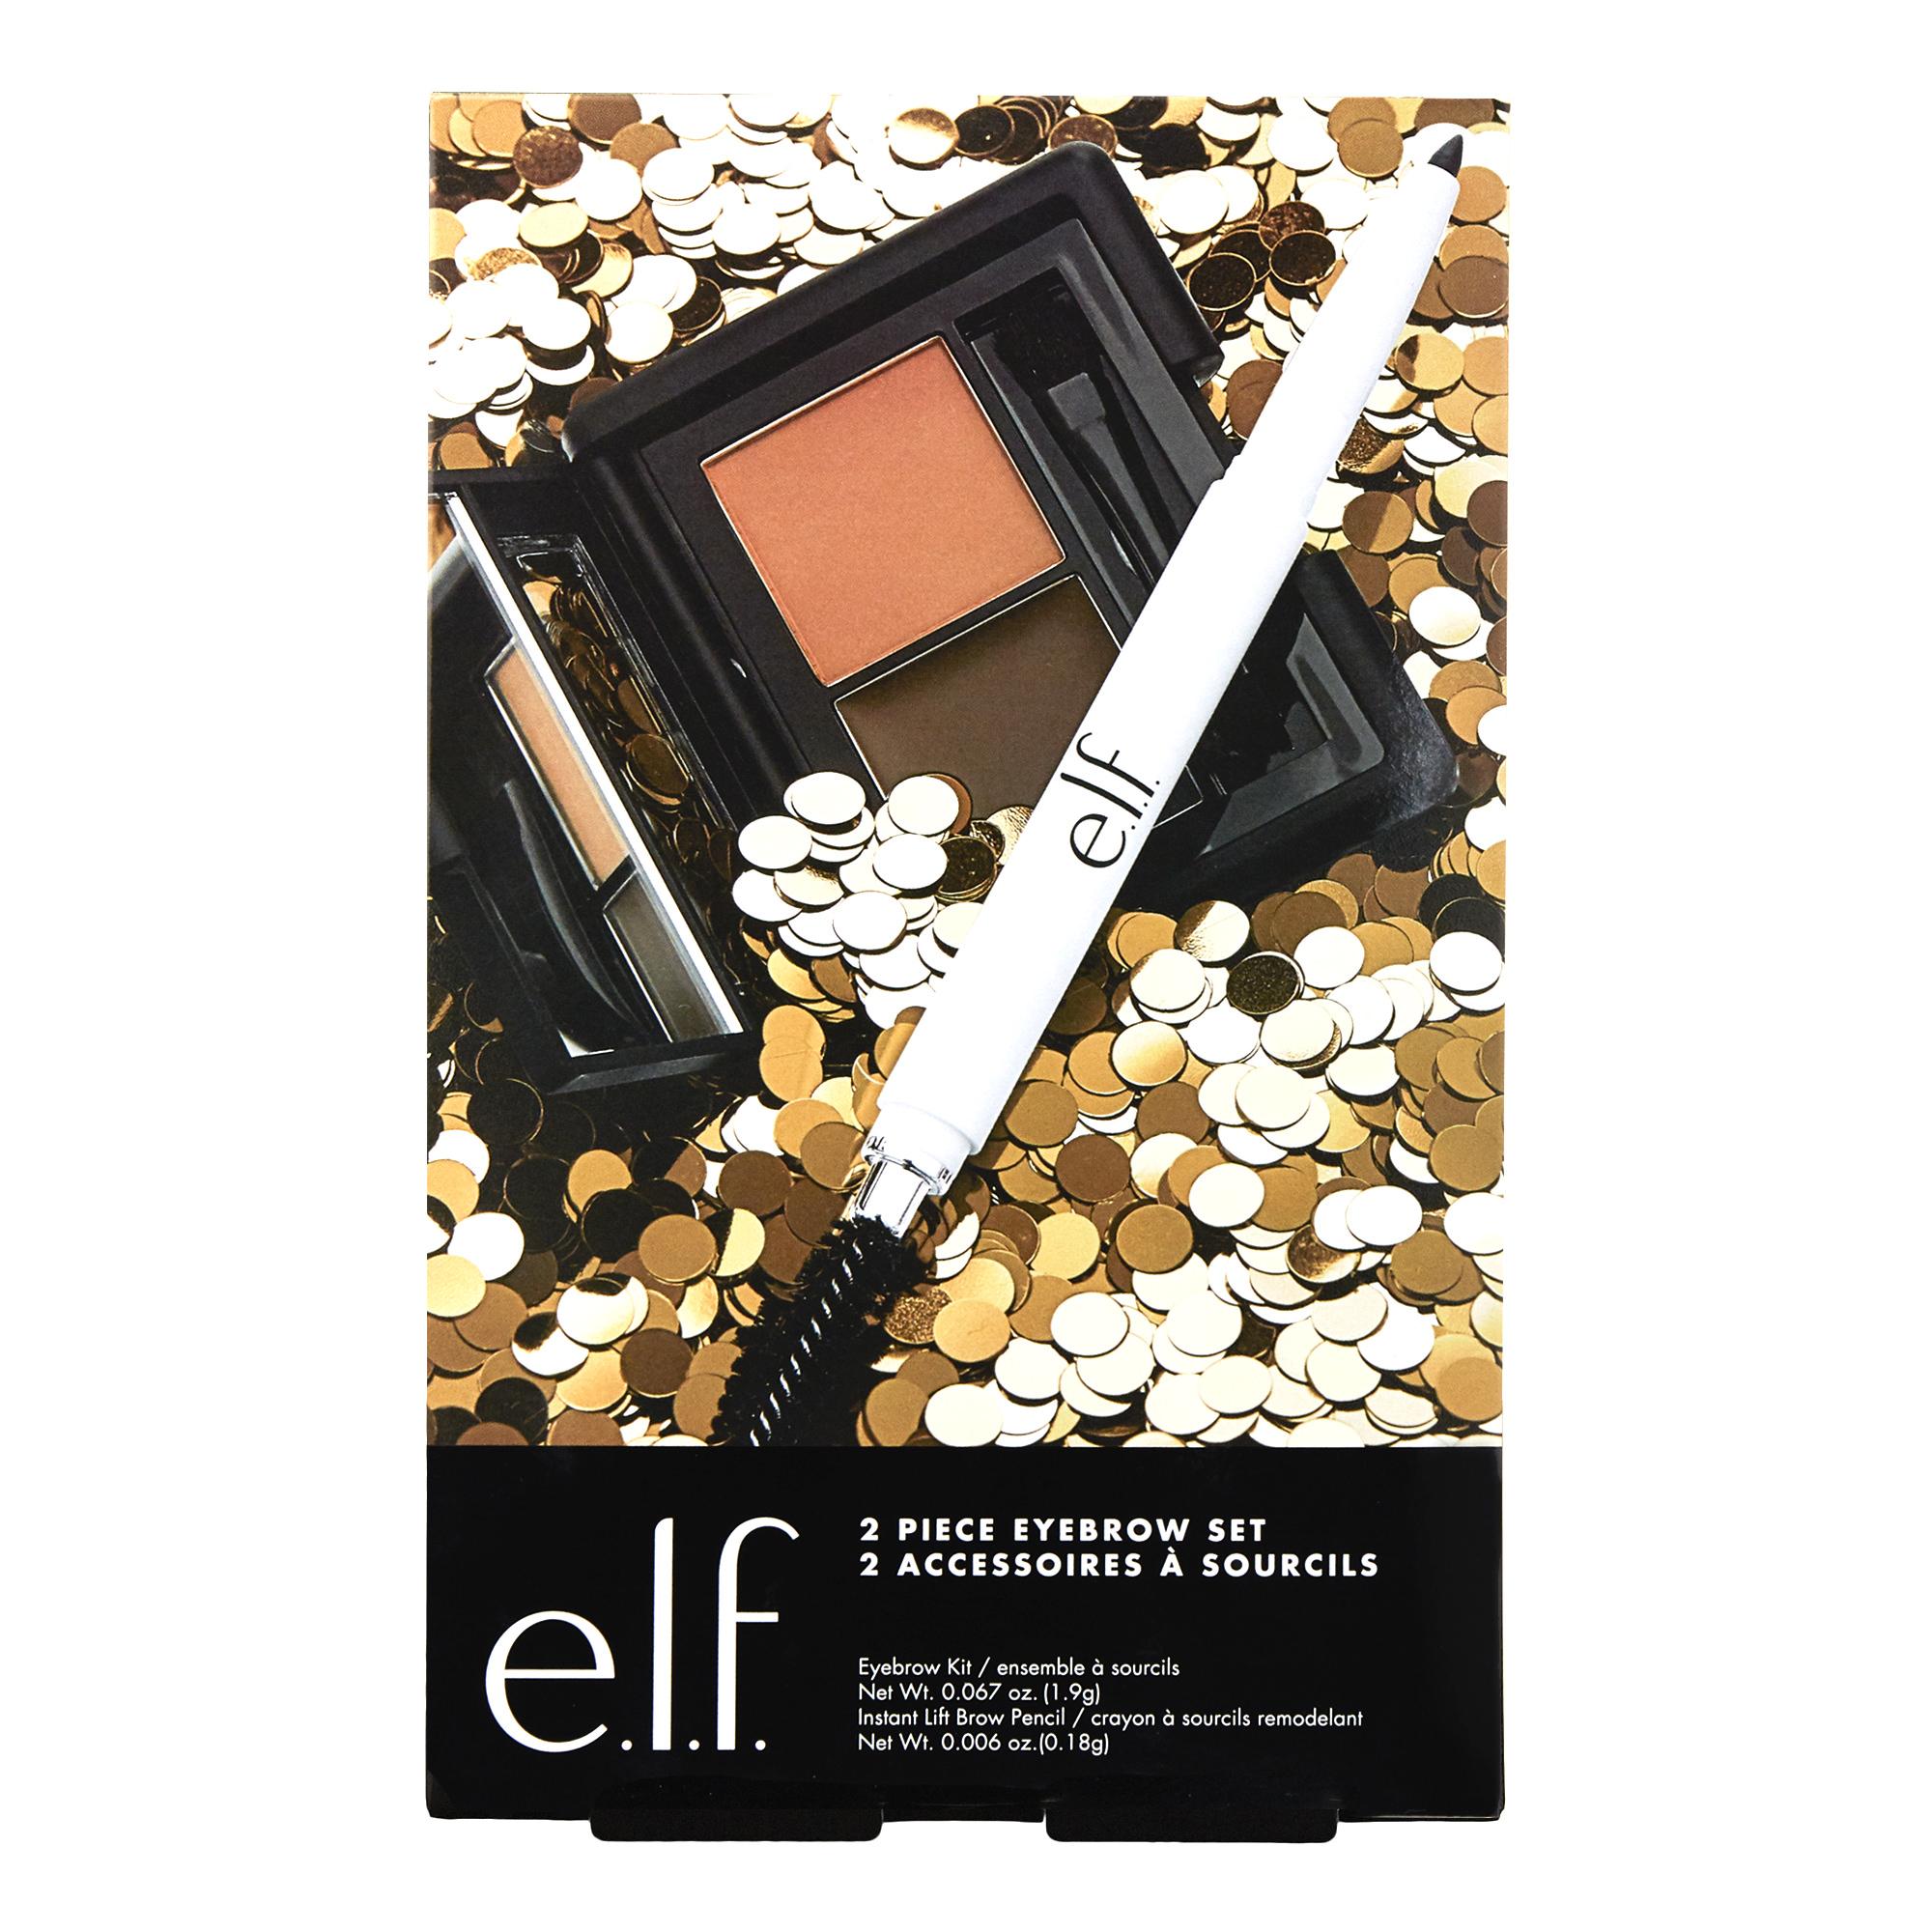 e.l.f. Cosmetics Holiday 2 Piece Eyebrow Gift Set